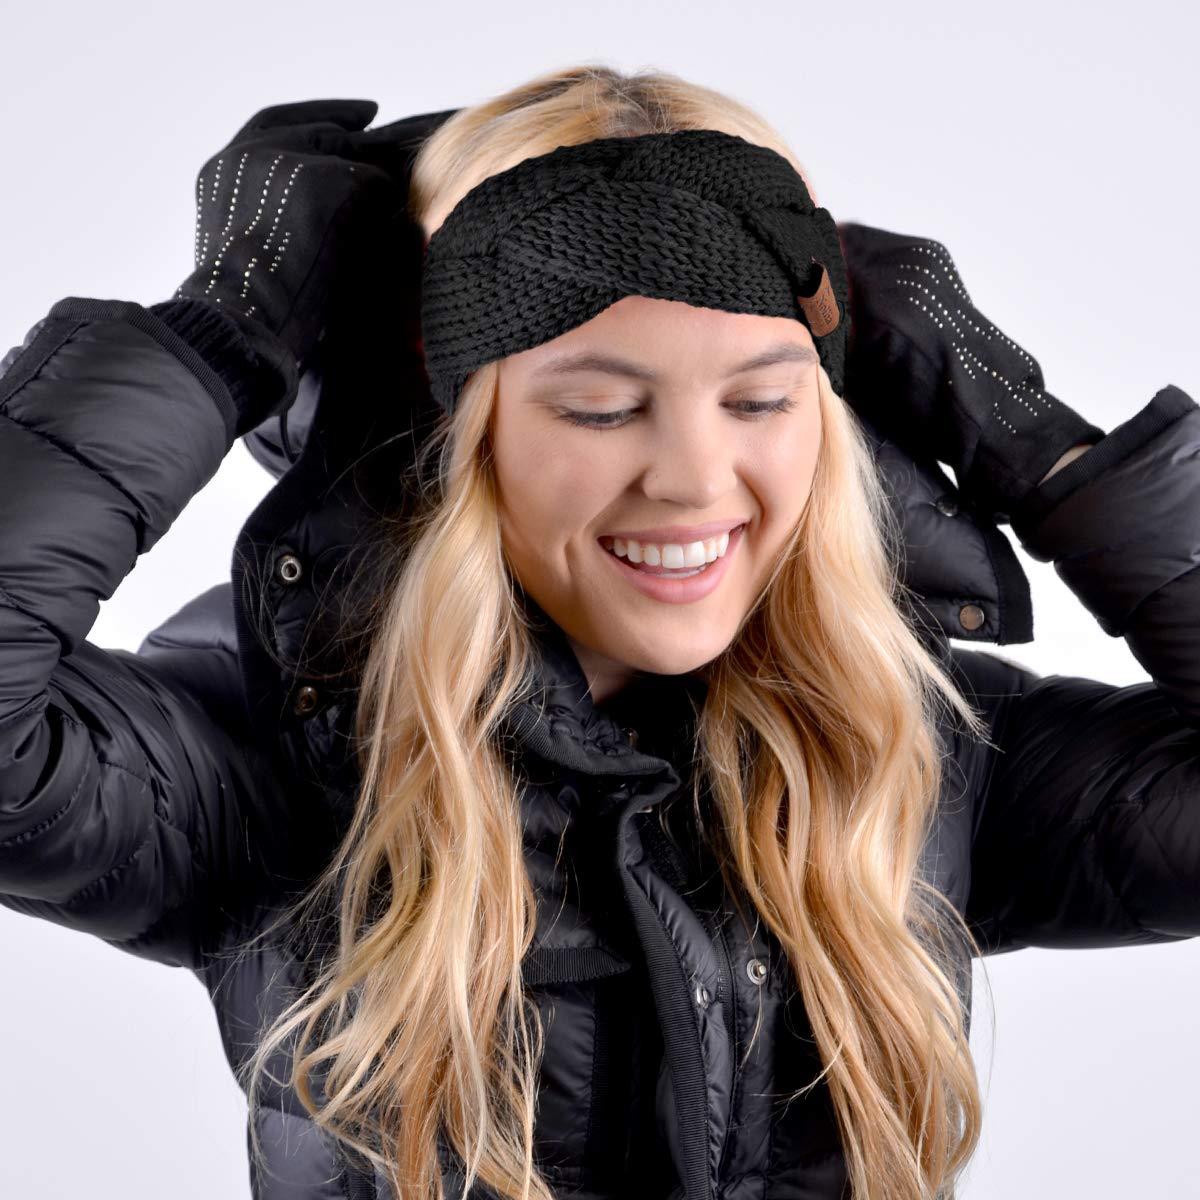 Nollia Braided Knit Winter Head Band Ear Muff Head Wrap Warmer for Women